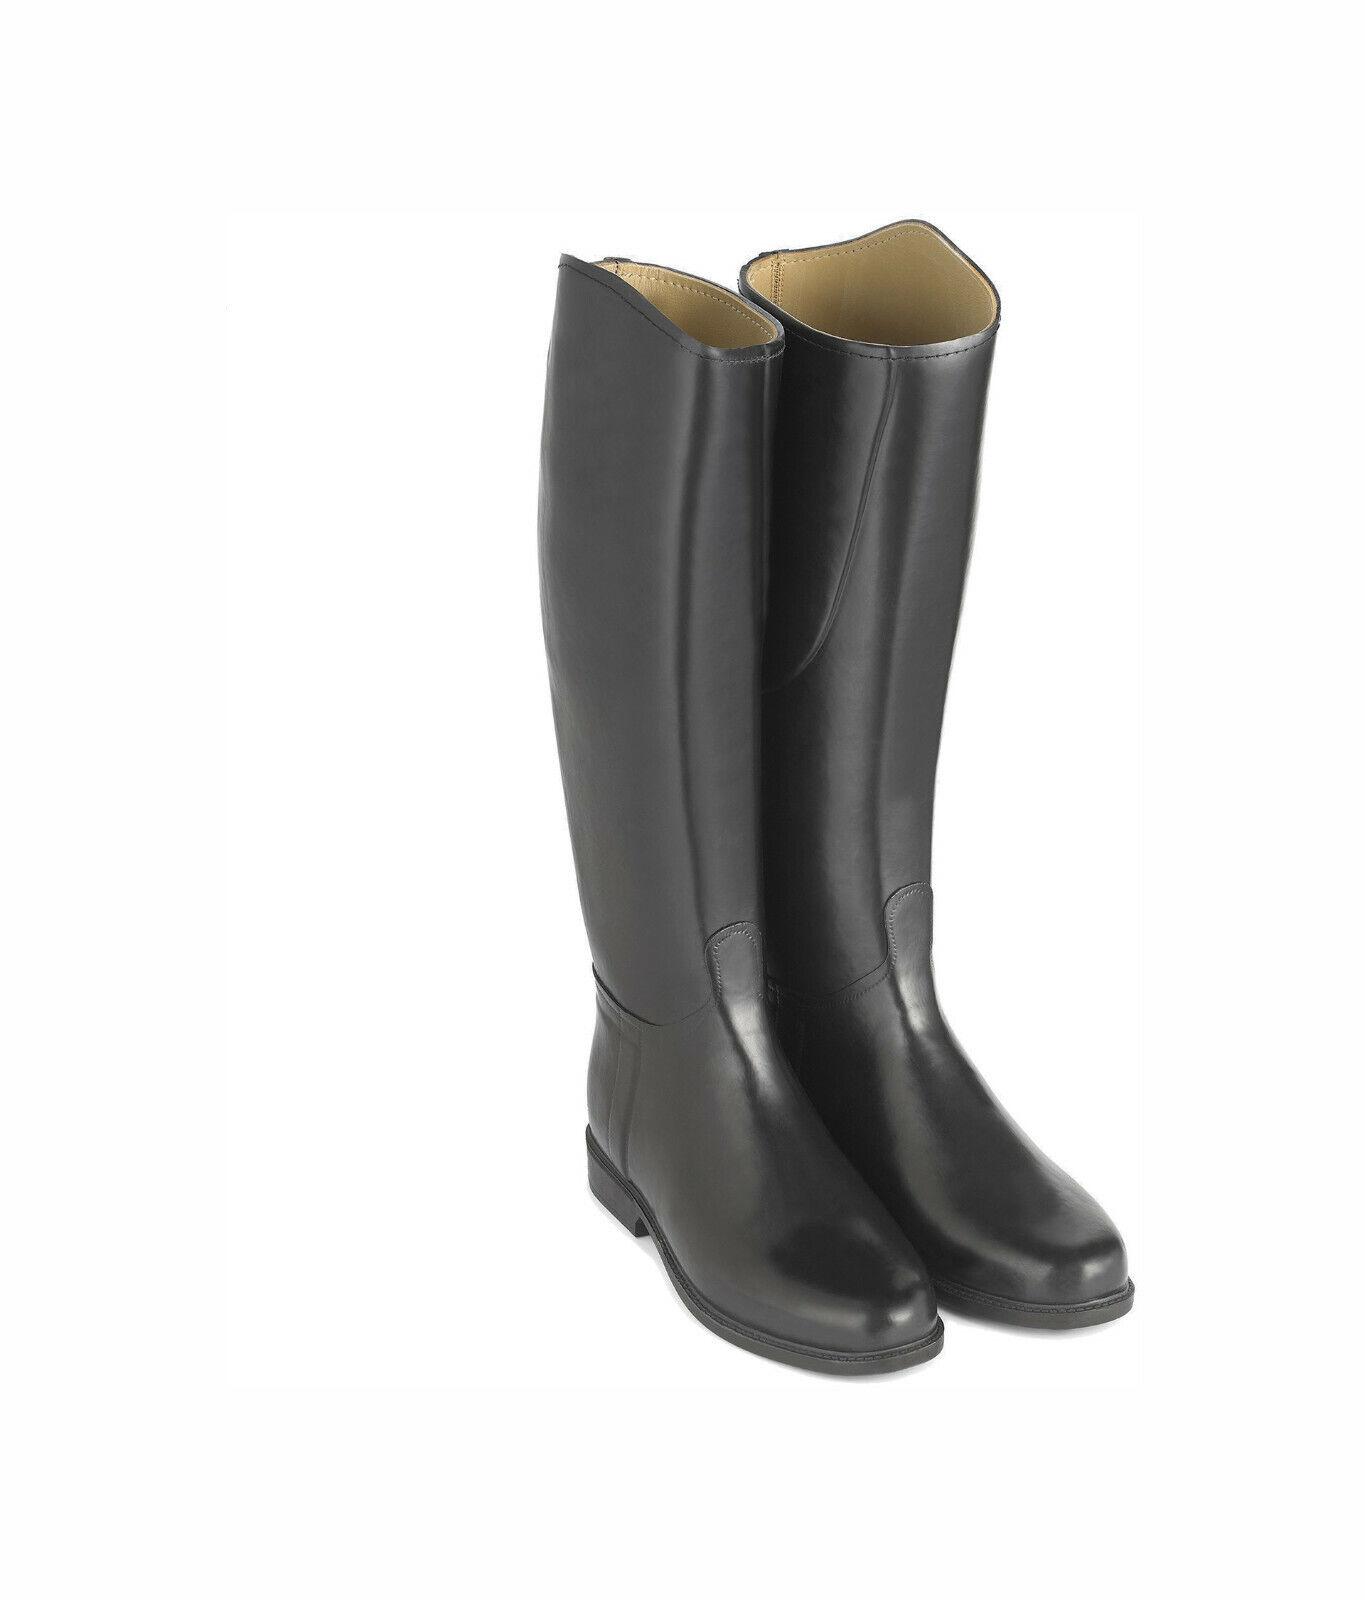 Le Chameau alezan cuir negro 44 reitbotas cuero forraje botas de goma pp